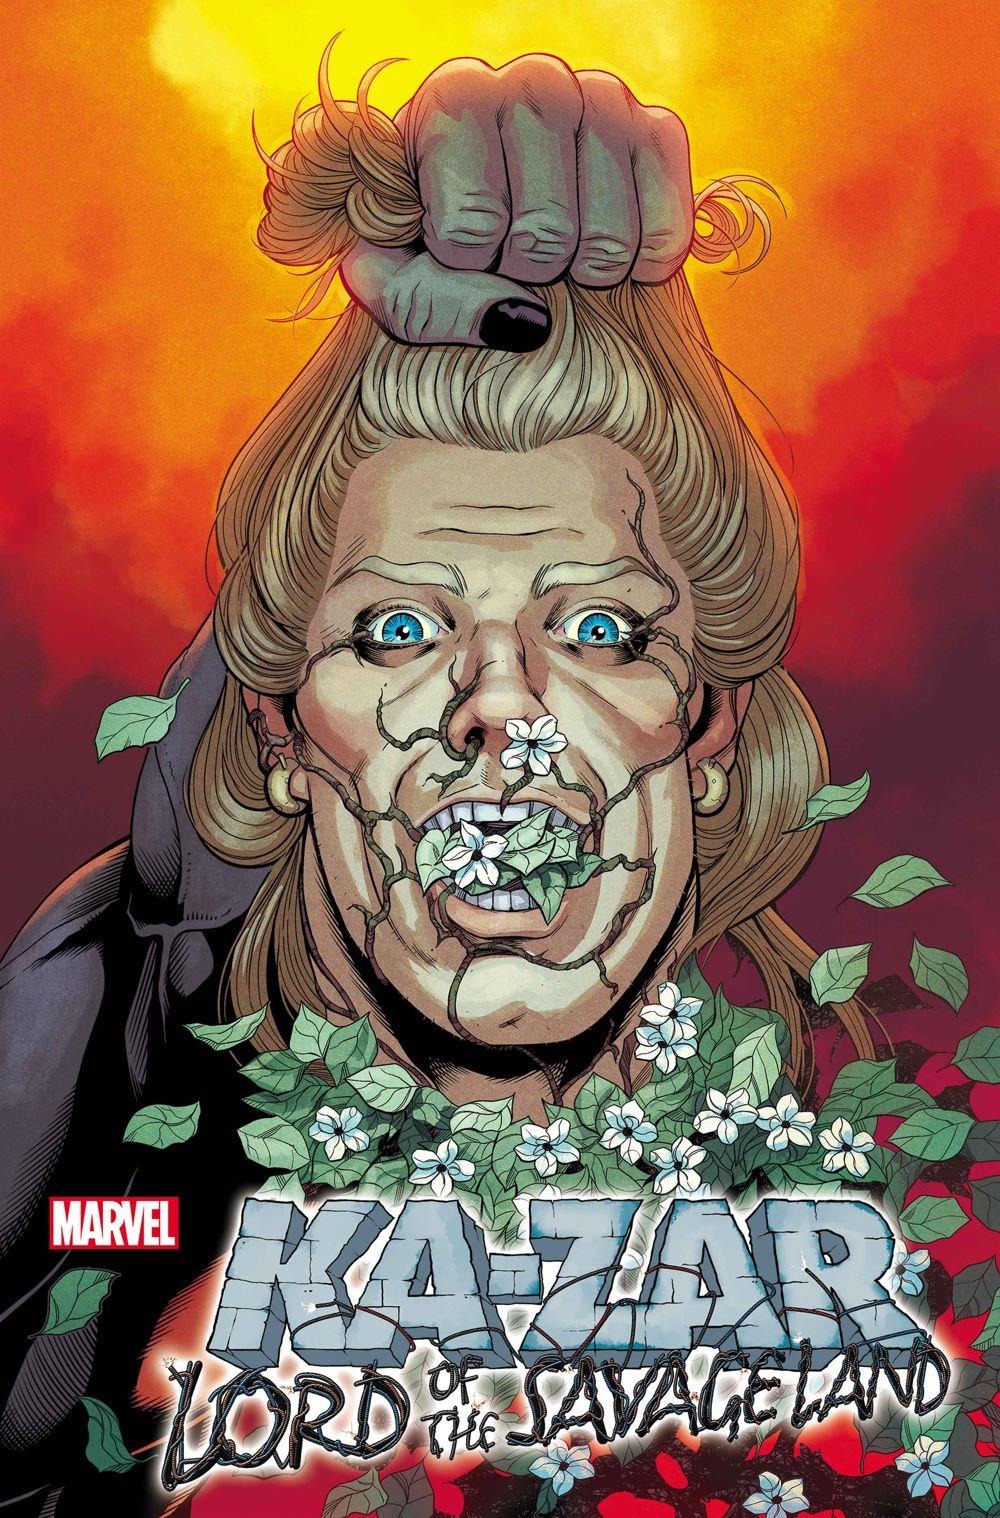 KAZARLORDSAVLAND2021001_variant First Look at KA-ZAR: LORD OF THE SAVAGE LAND #1 from Marvel Comics